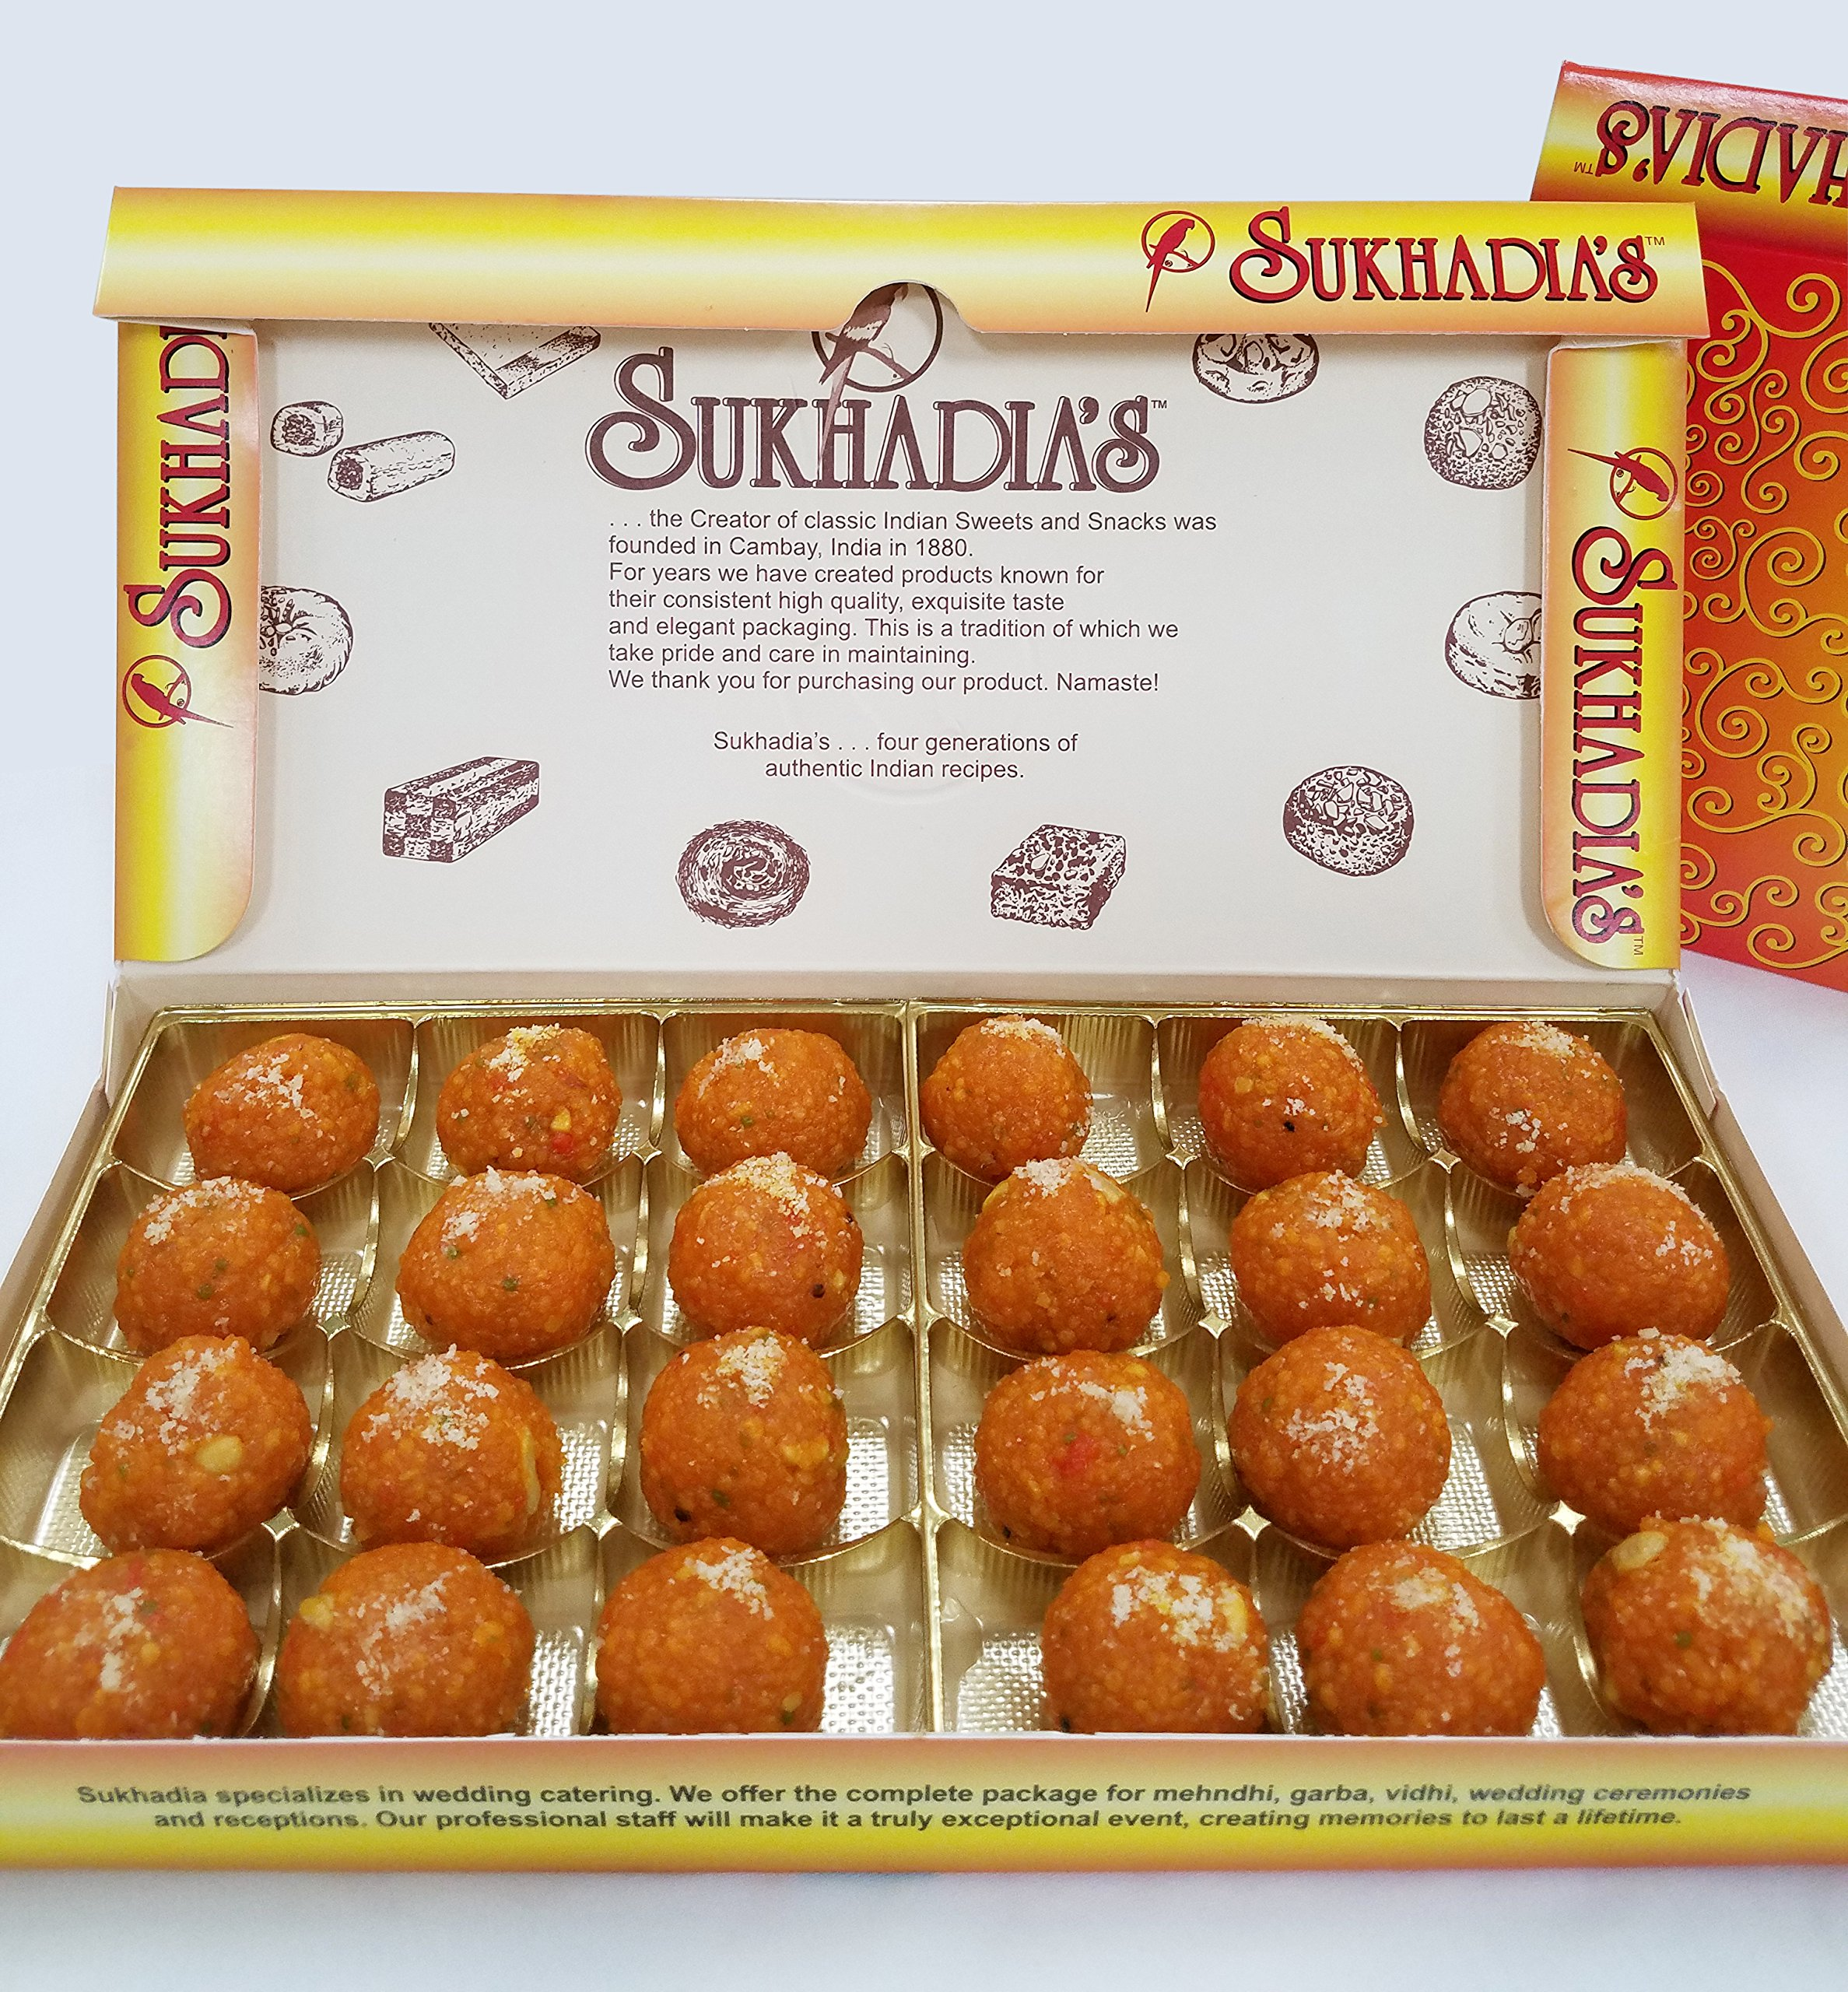 Sukhadia's Motichoor Ladoo Indian Sweet, 2LB Box (32oz) by Sukhadia's